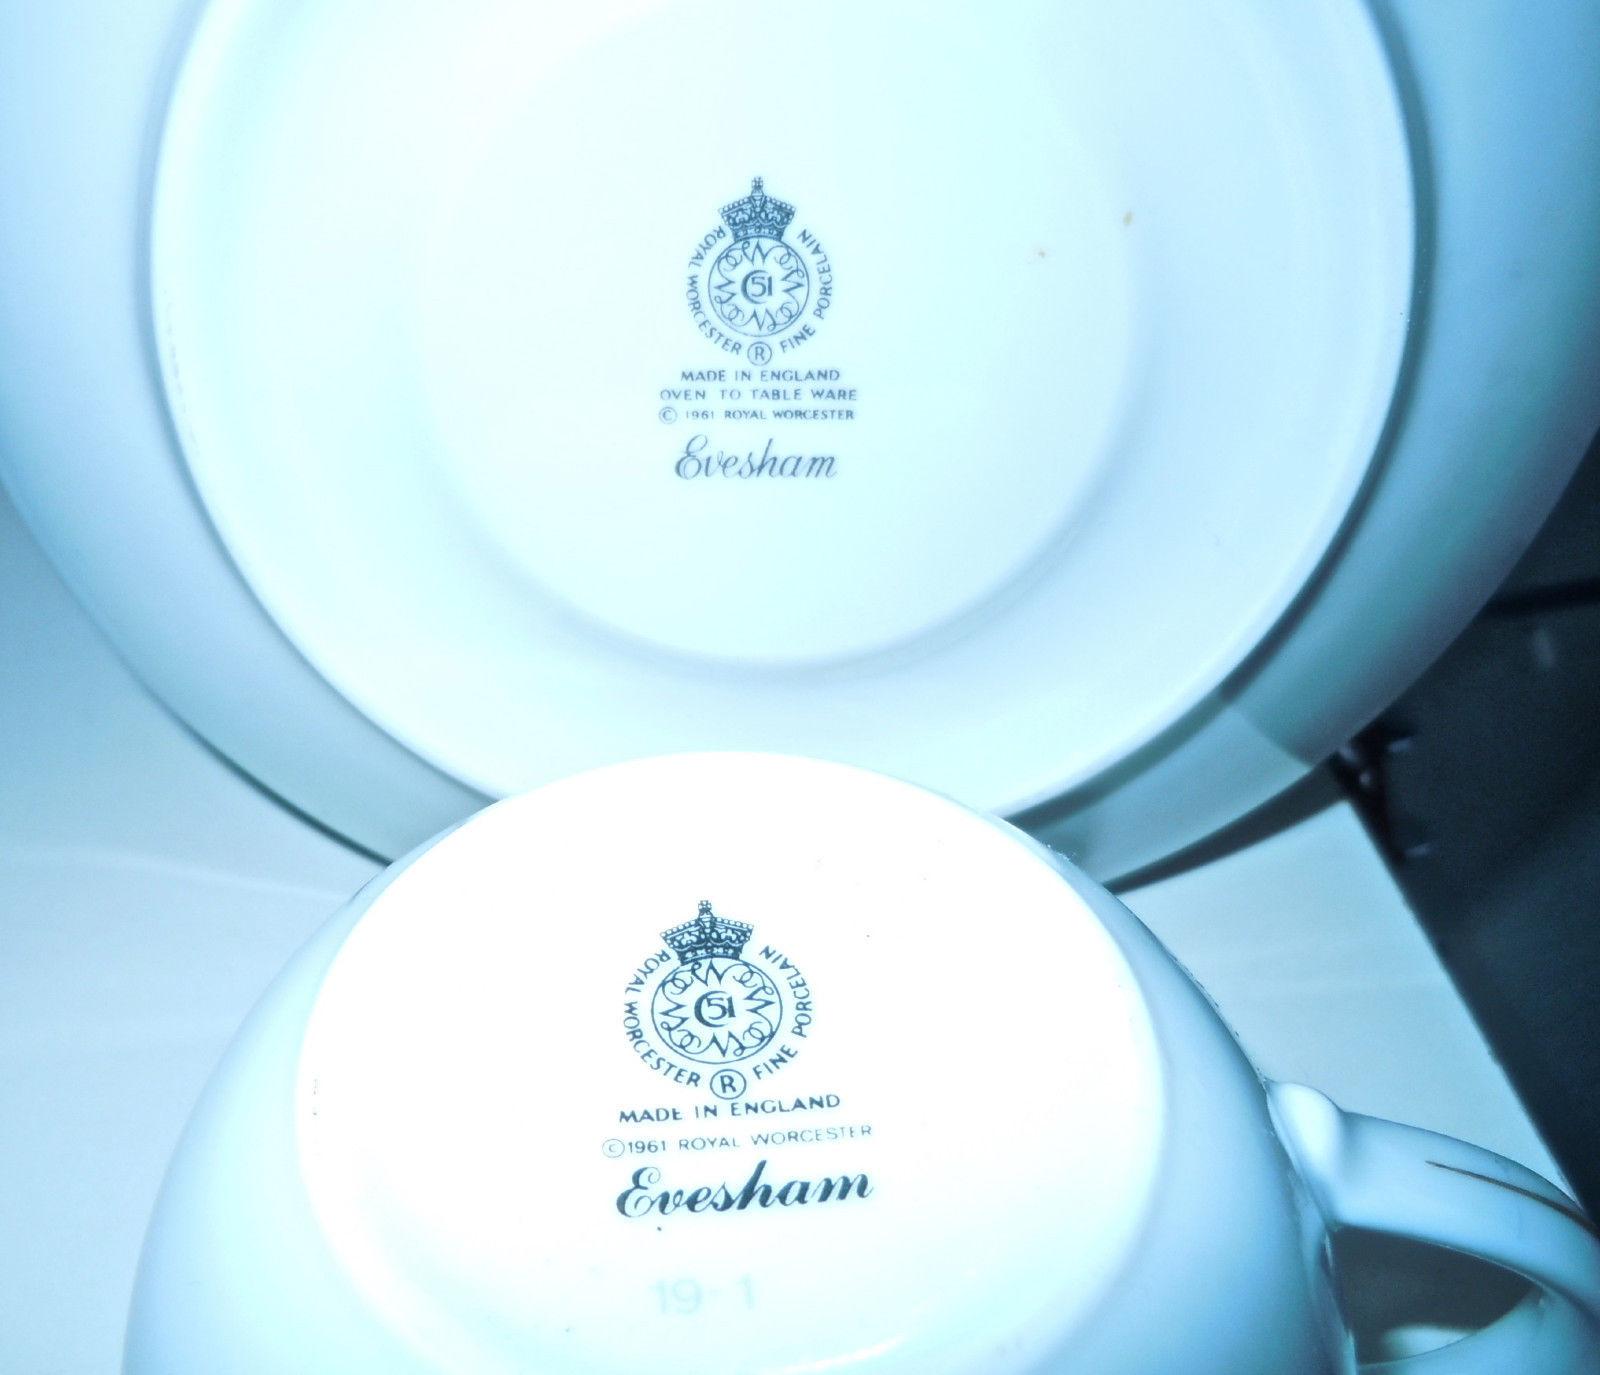 Royal Worcester Evesham Gold Cup and Saucer Set Gold on Sides of Handle